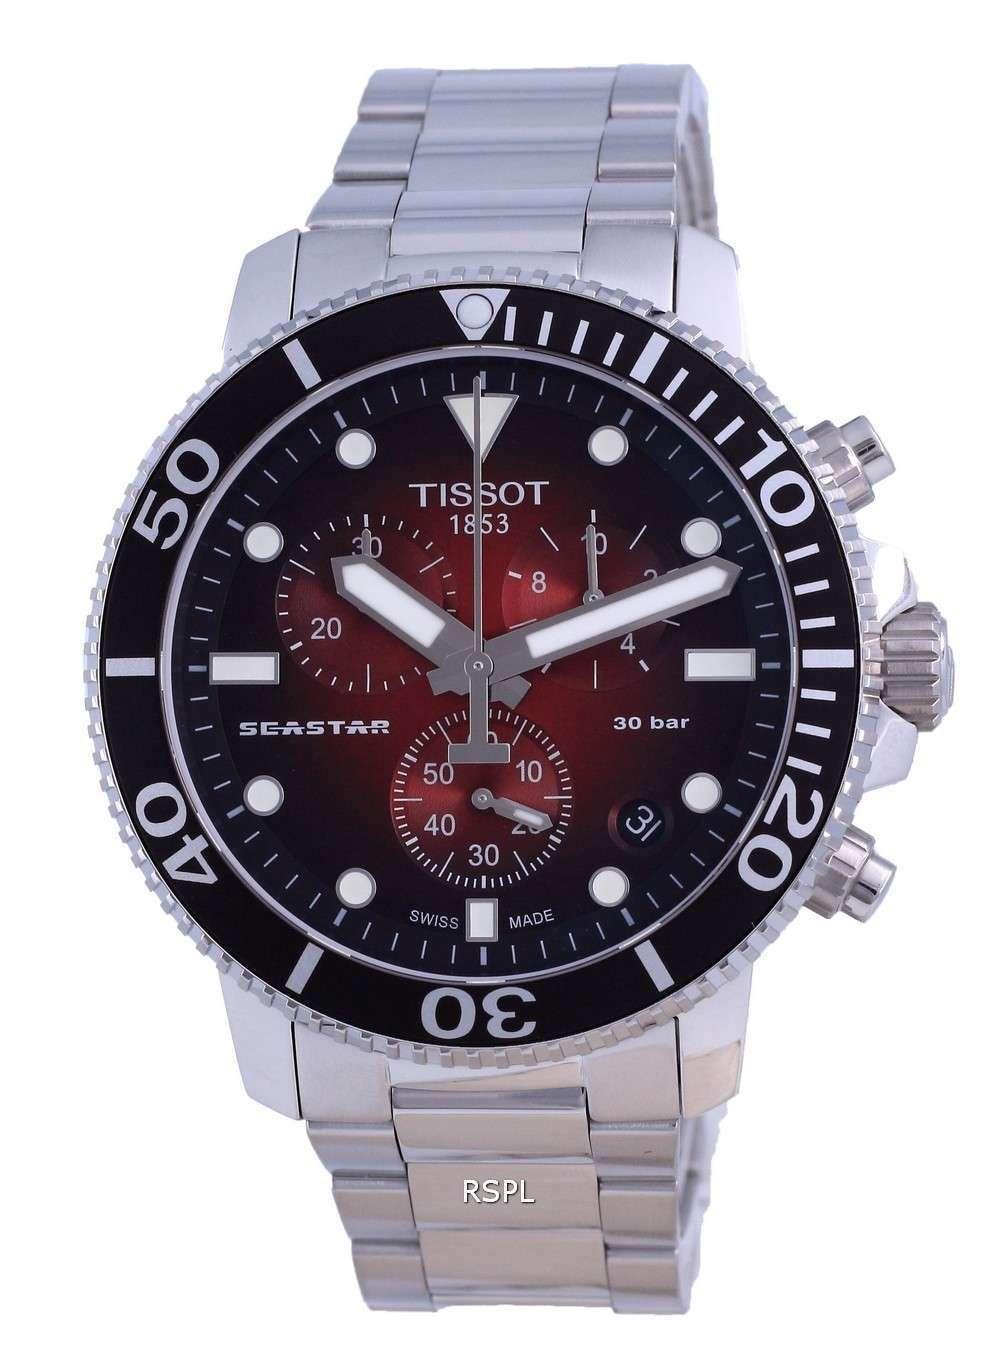 Tissot T-Sport Seaster 1000 Chronograph Diver&#39,s Quartz T120.417.11.421.00 T1204171142100 300M Reloj para hombre